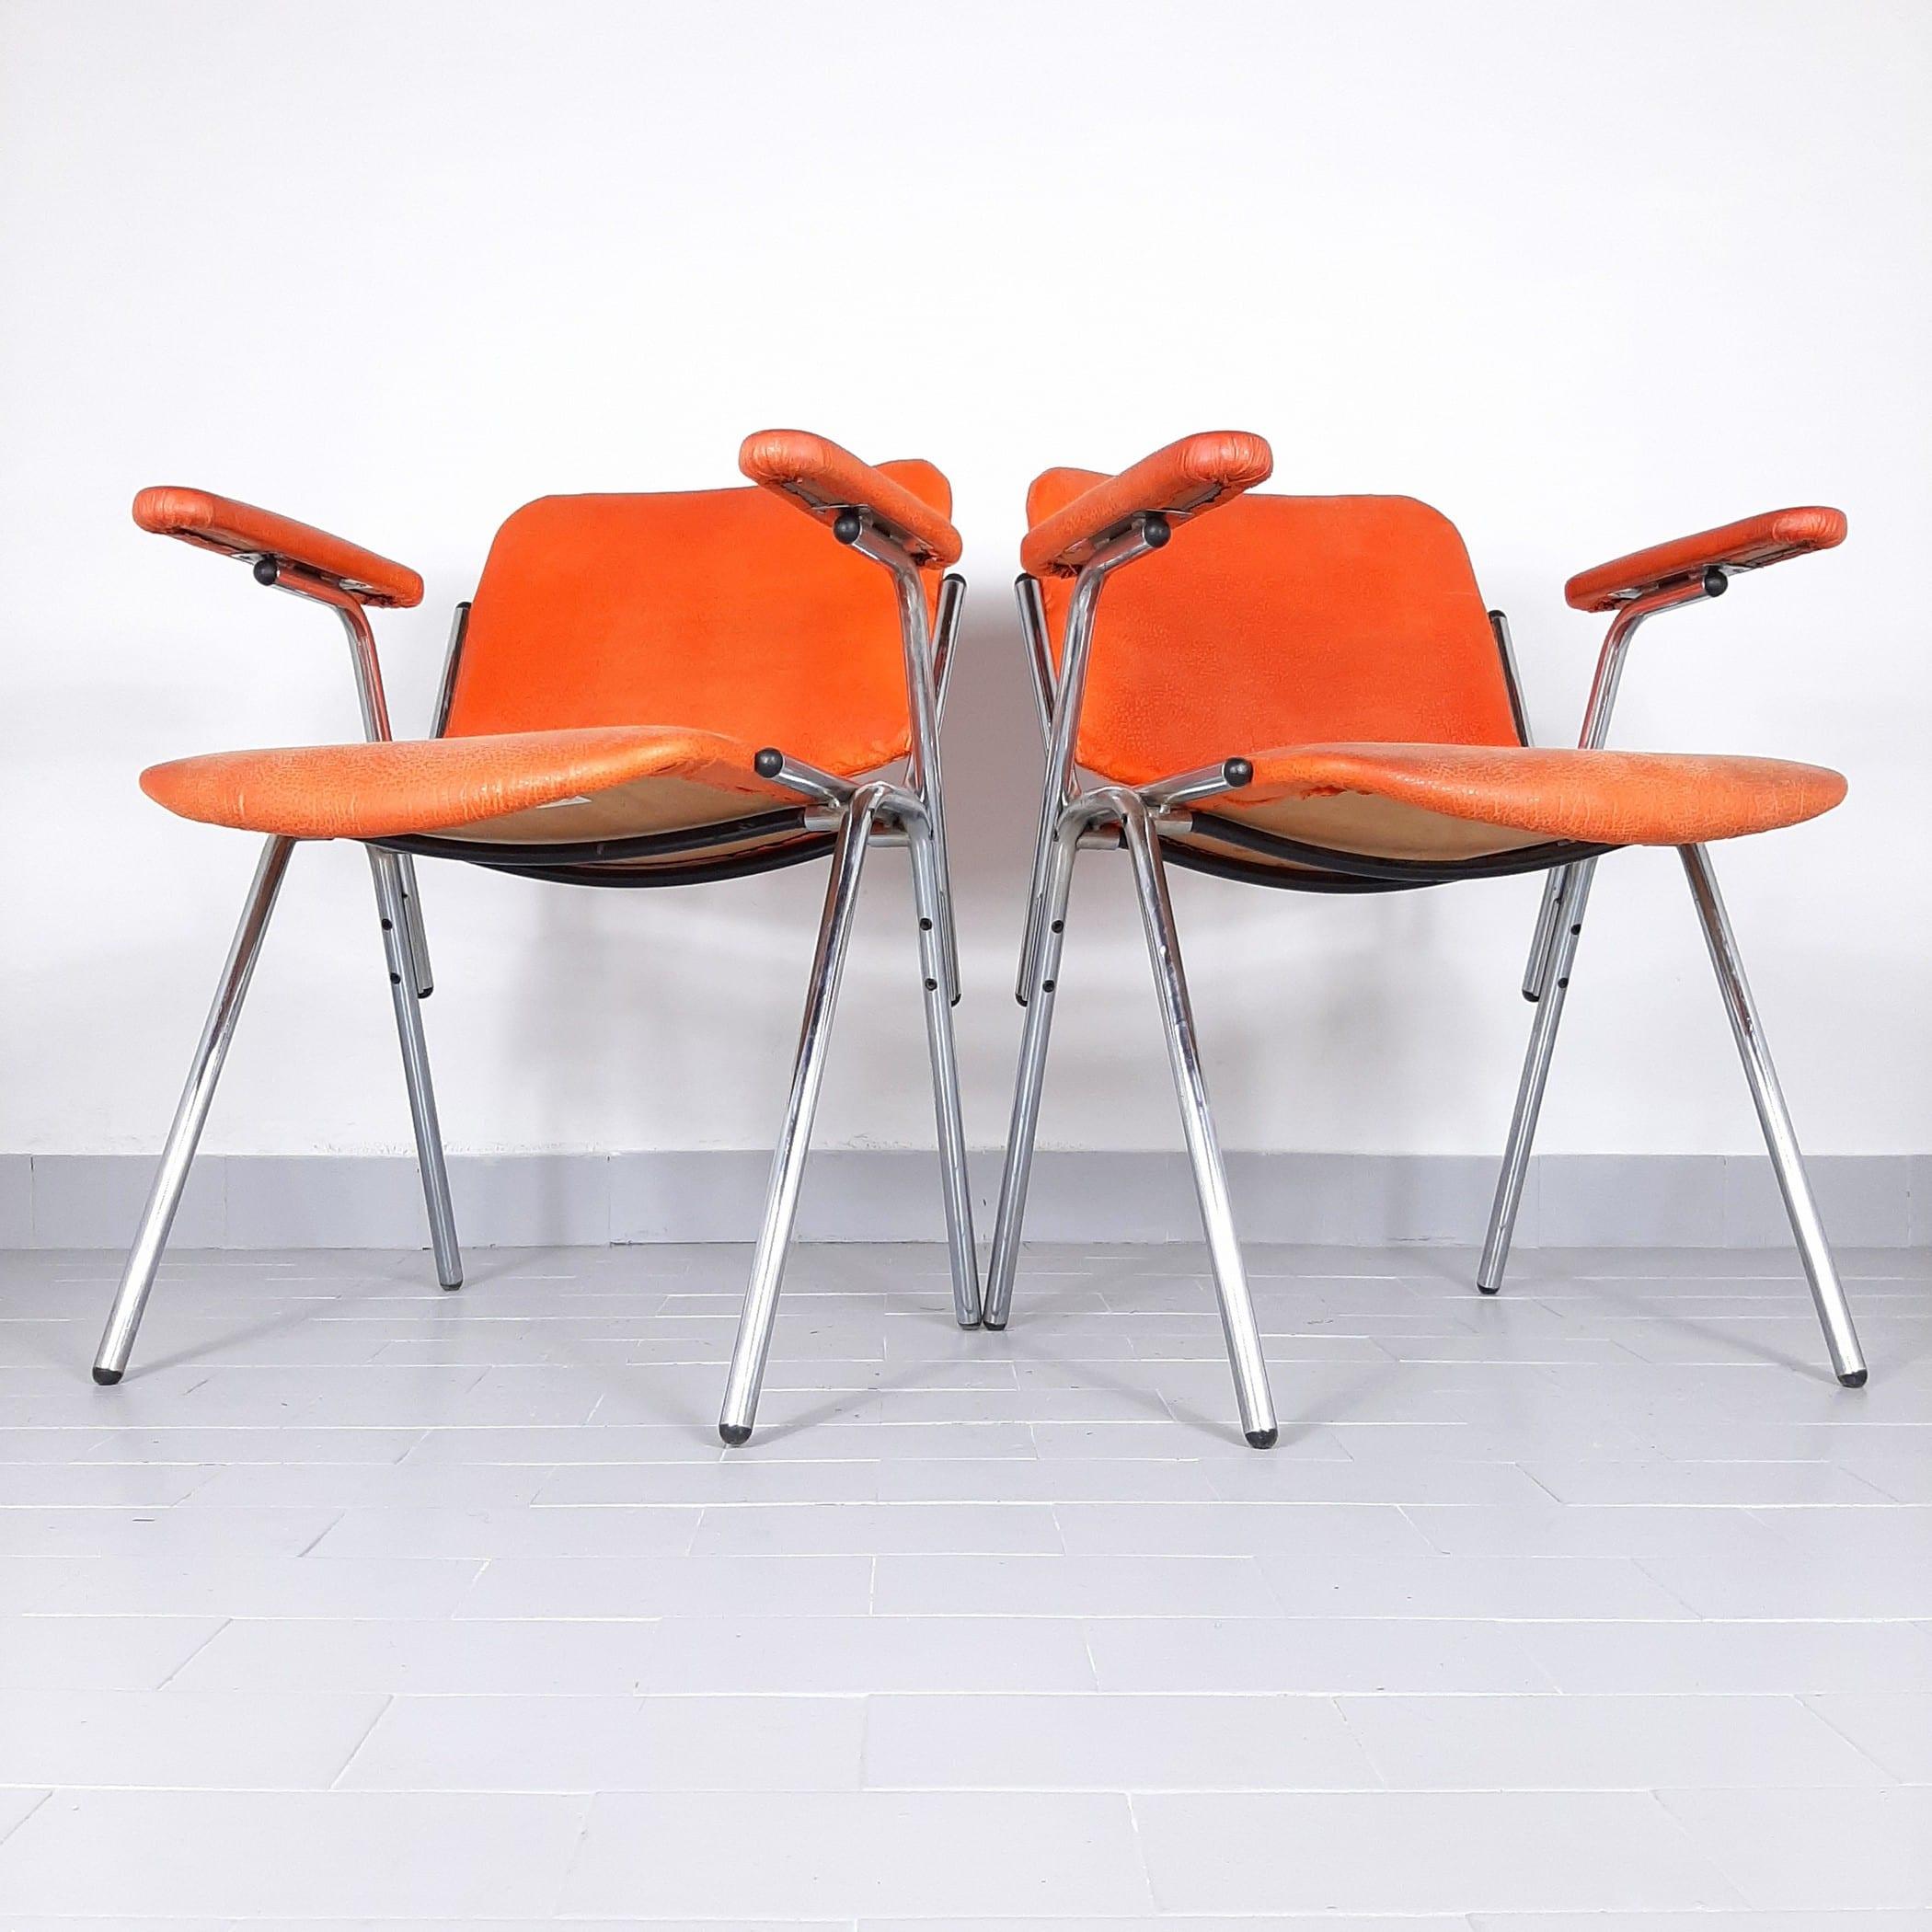 1 of 2 Mid-century office chair Stol Kamnik Yugoslavia 1980s Original Orange leatherette Metal Chrome Leg Retro office